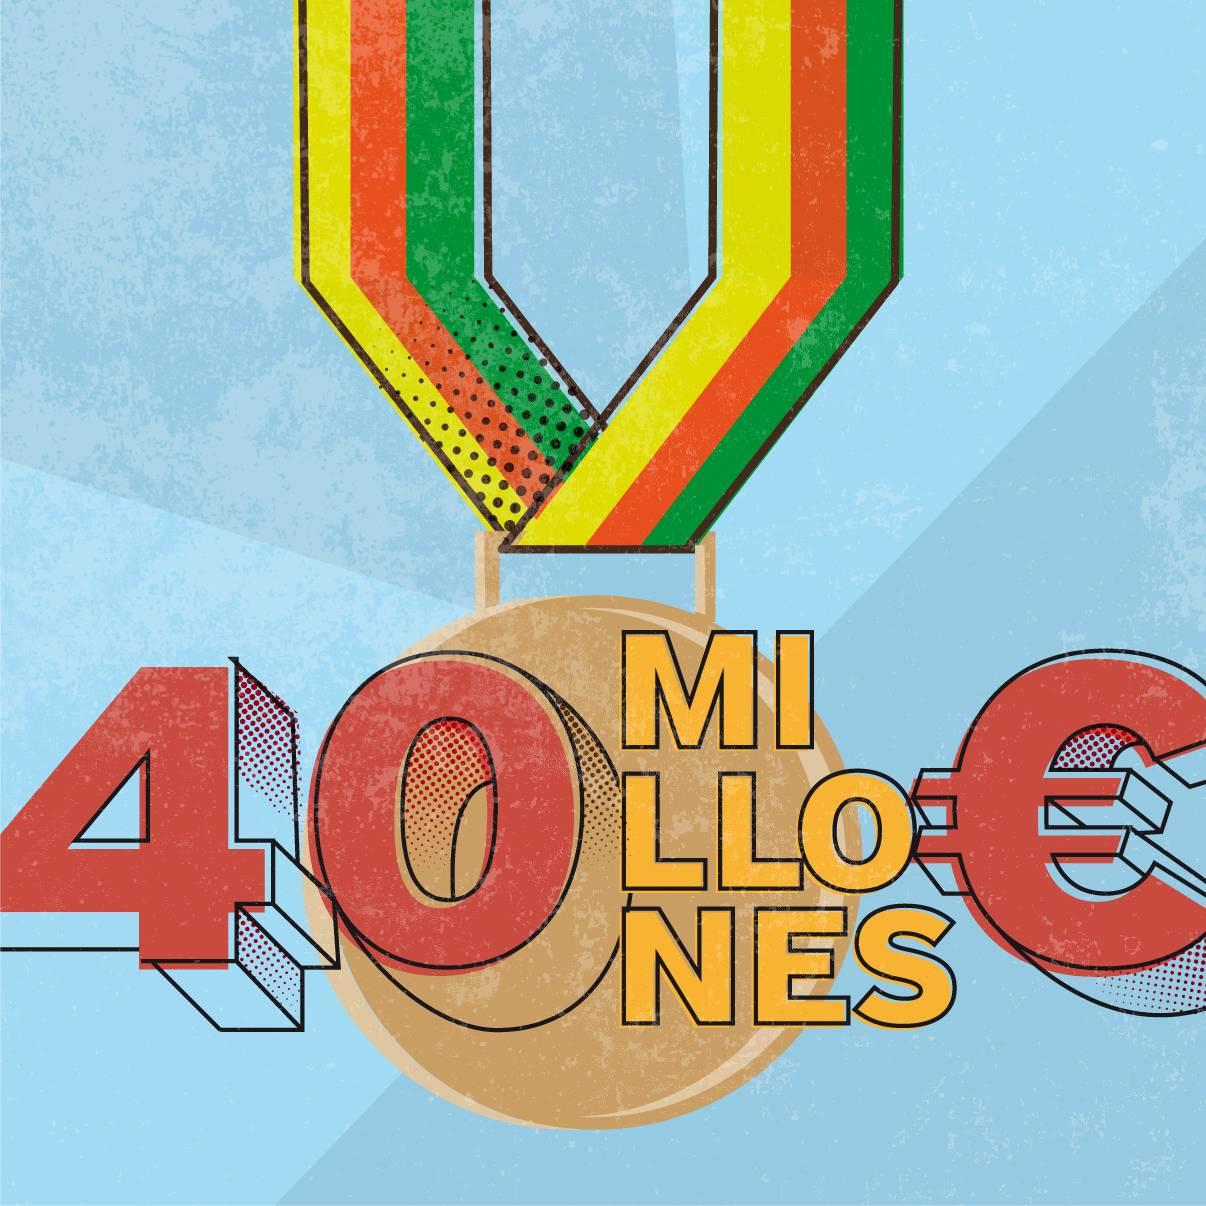 Medalla, UC3M